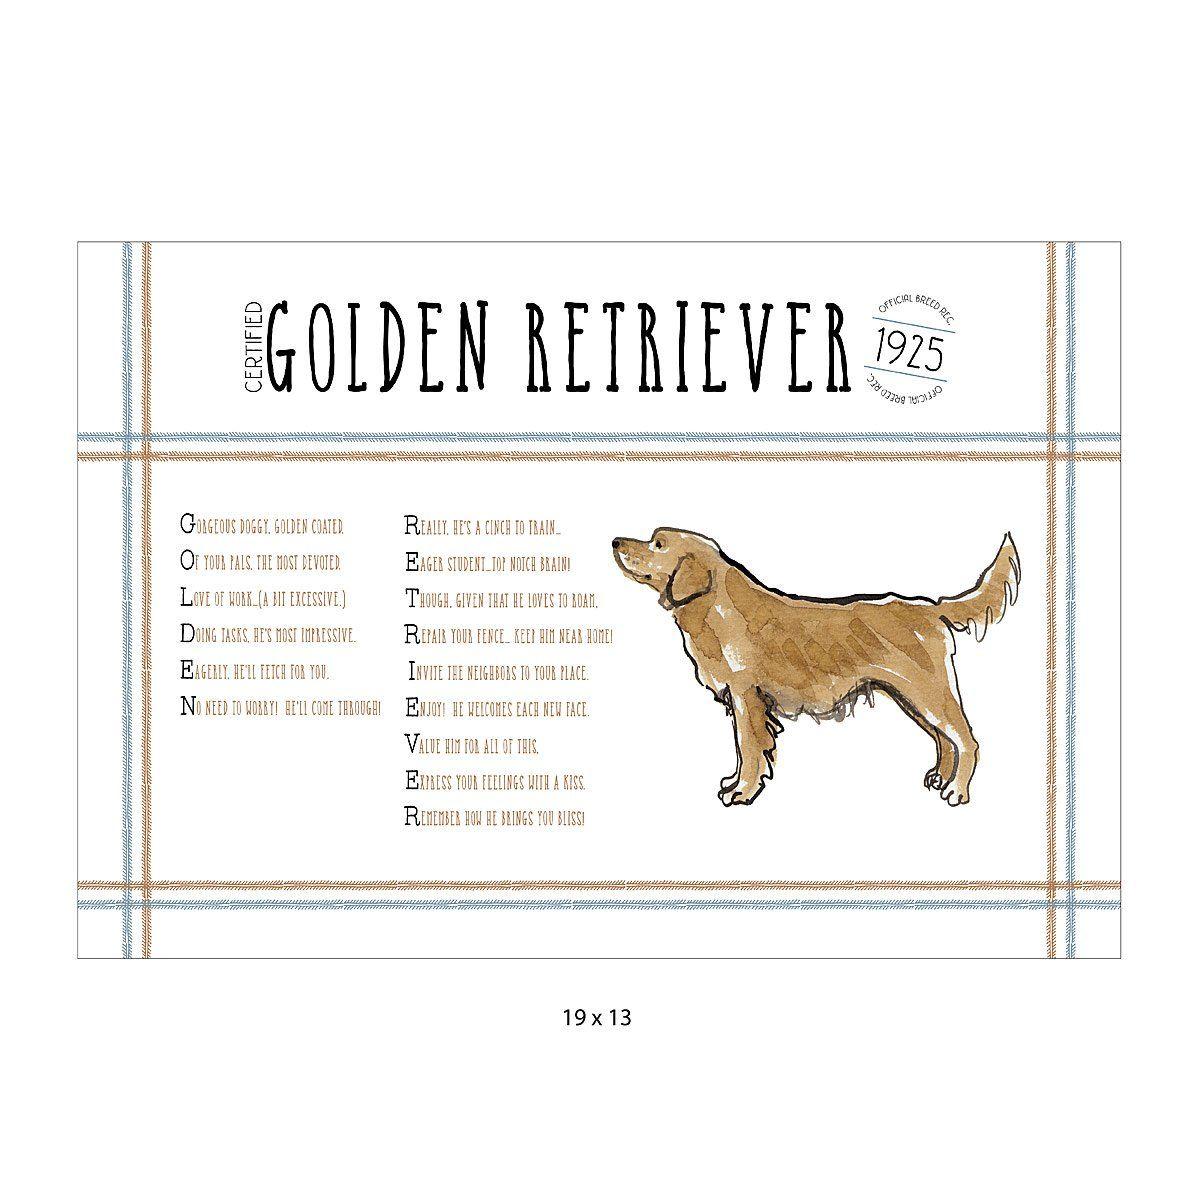 Pedigree Poem Art Dog Lover Gifts Retriever Puppy Golden